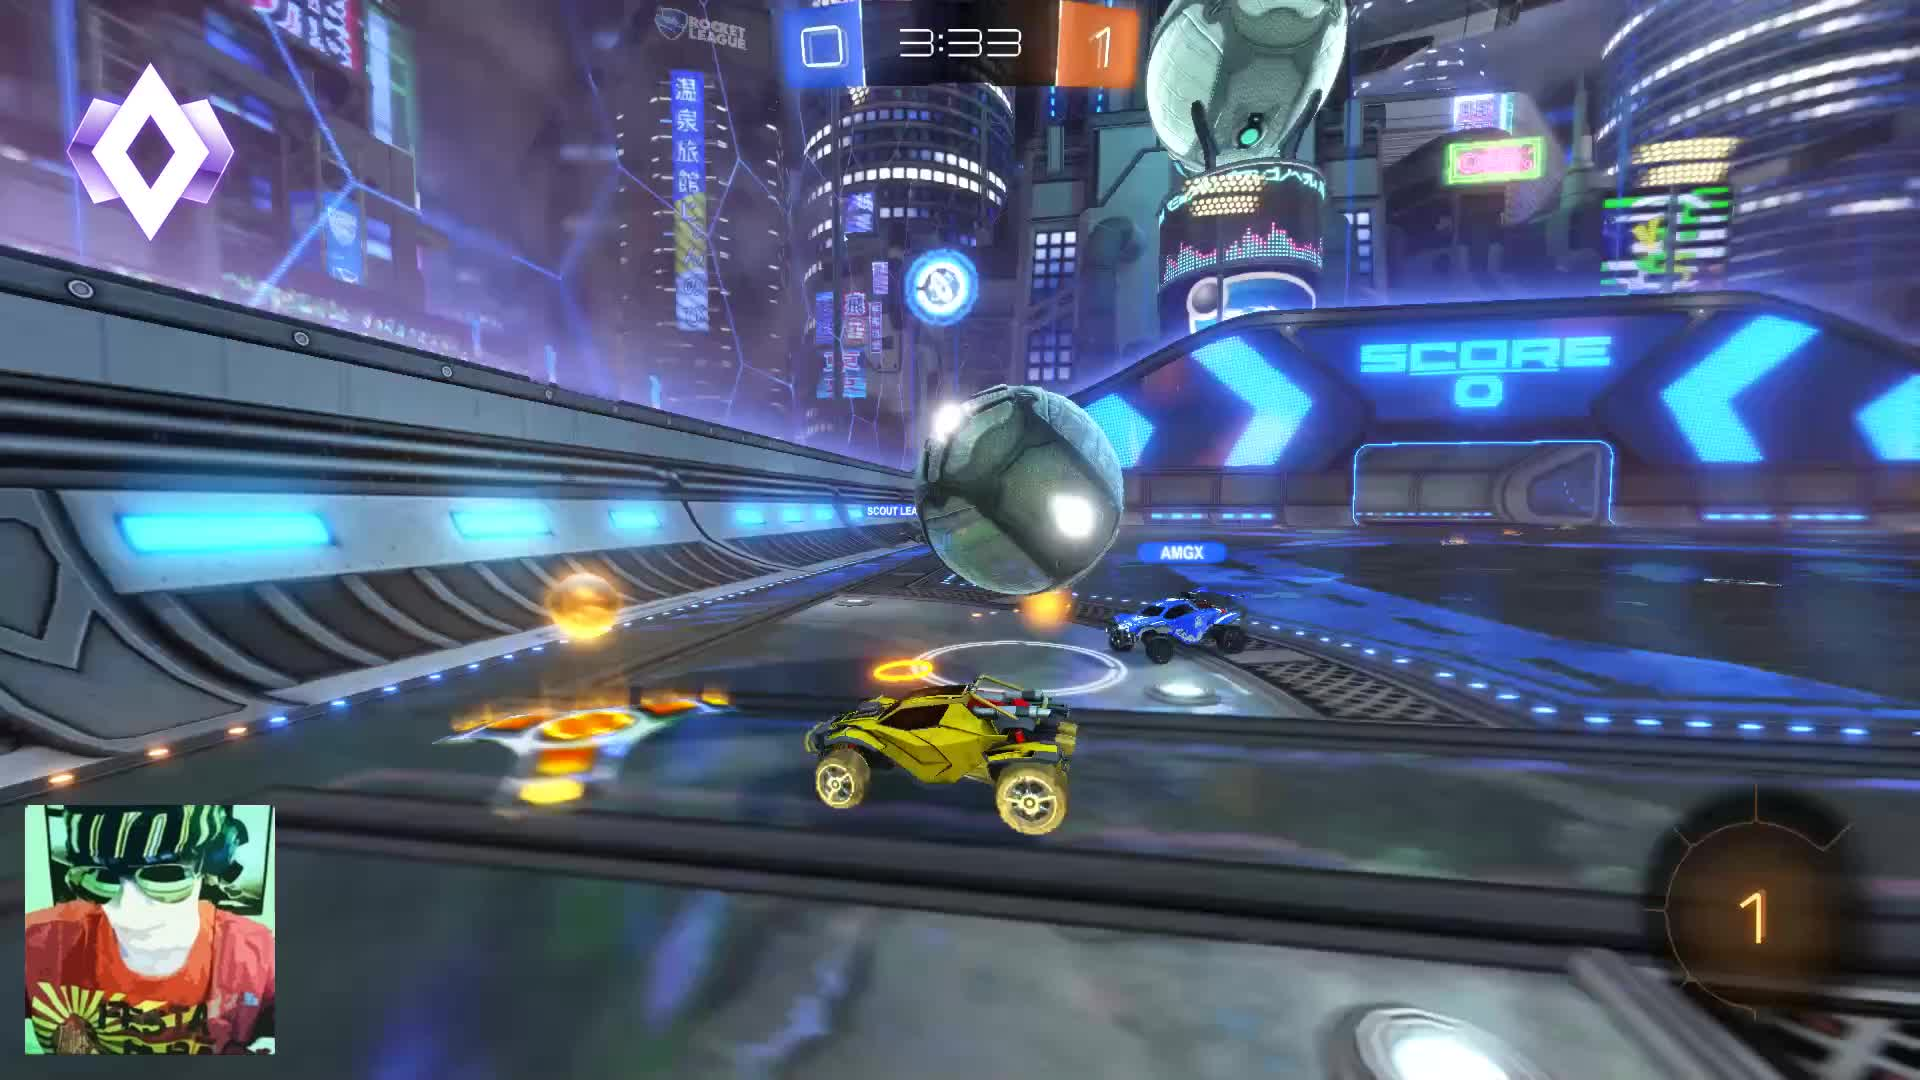 Gif Your Game, GifYourGame, Goal, Rocket League, RocketLeague, alex, Goal 2: alex GIFs